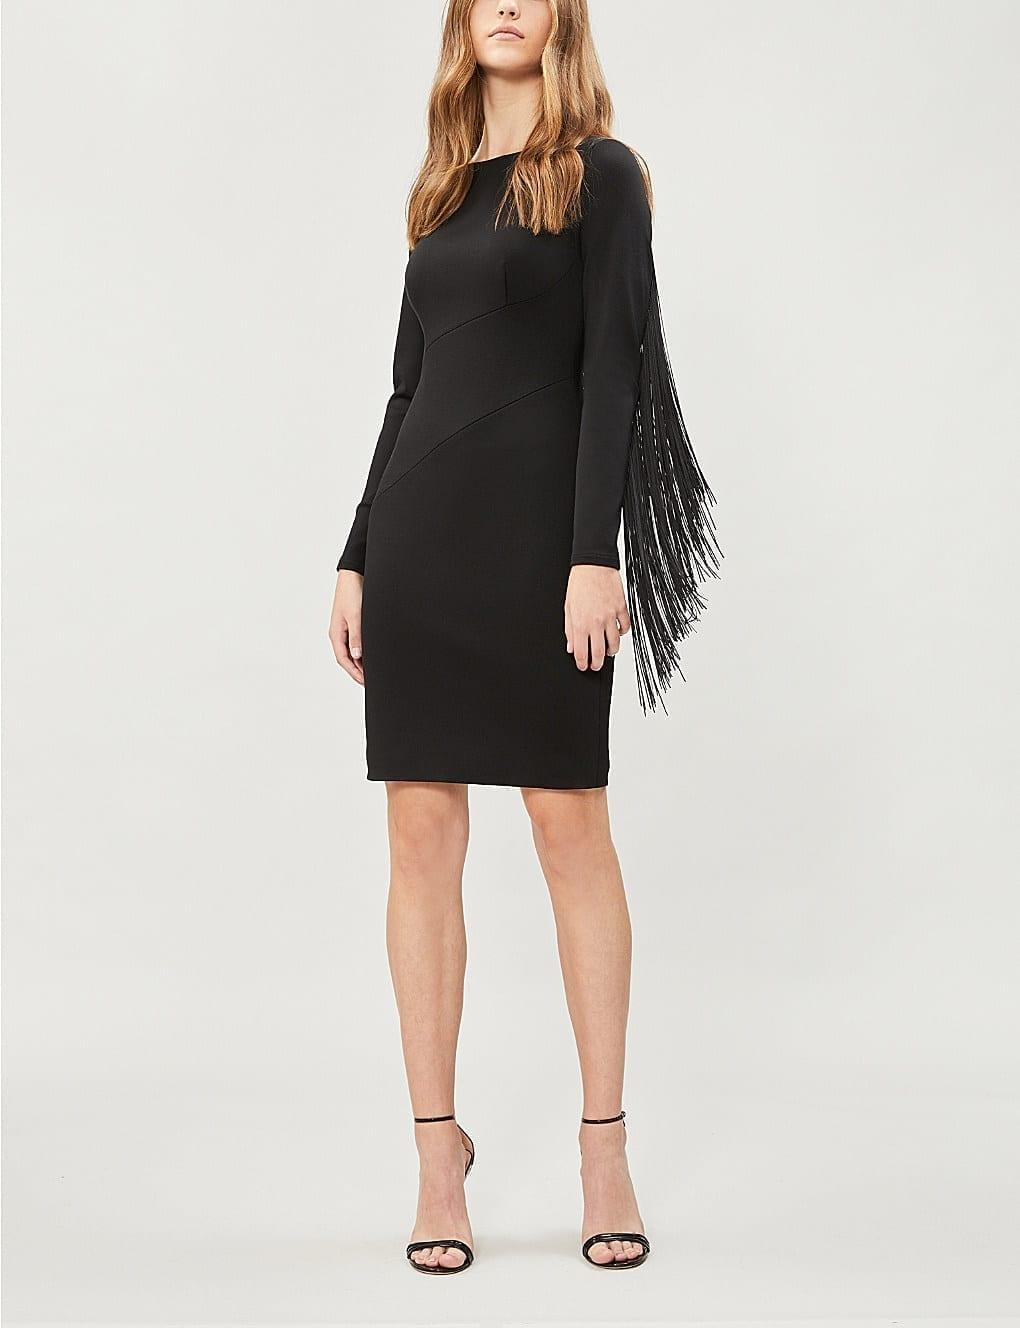 KAREN MILLEN Fantasy Fringe Trimmed Woven Black Dress